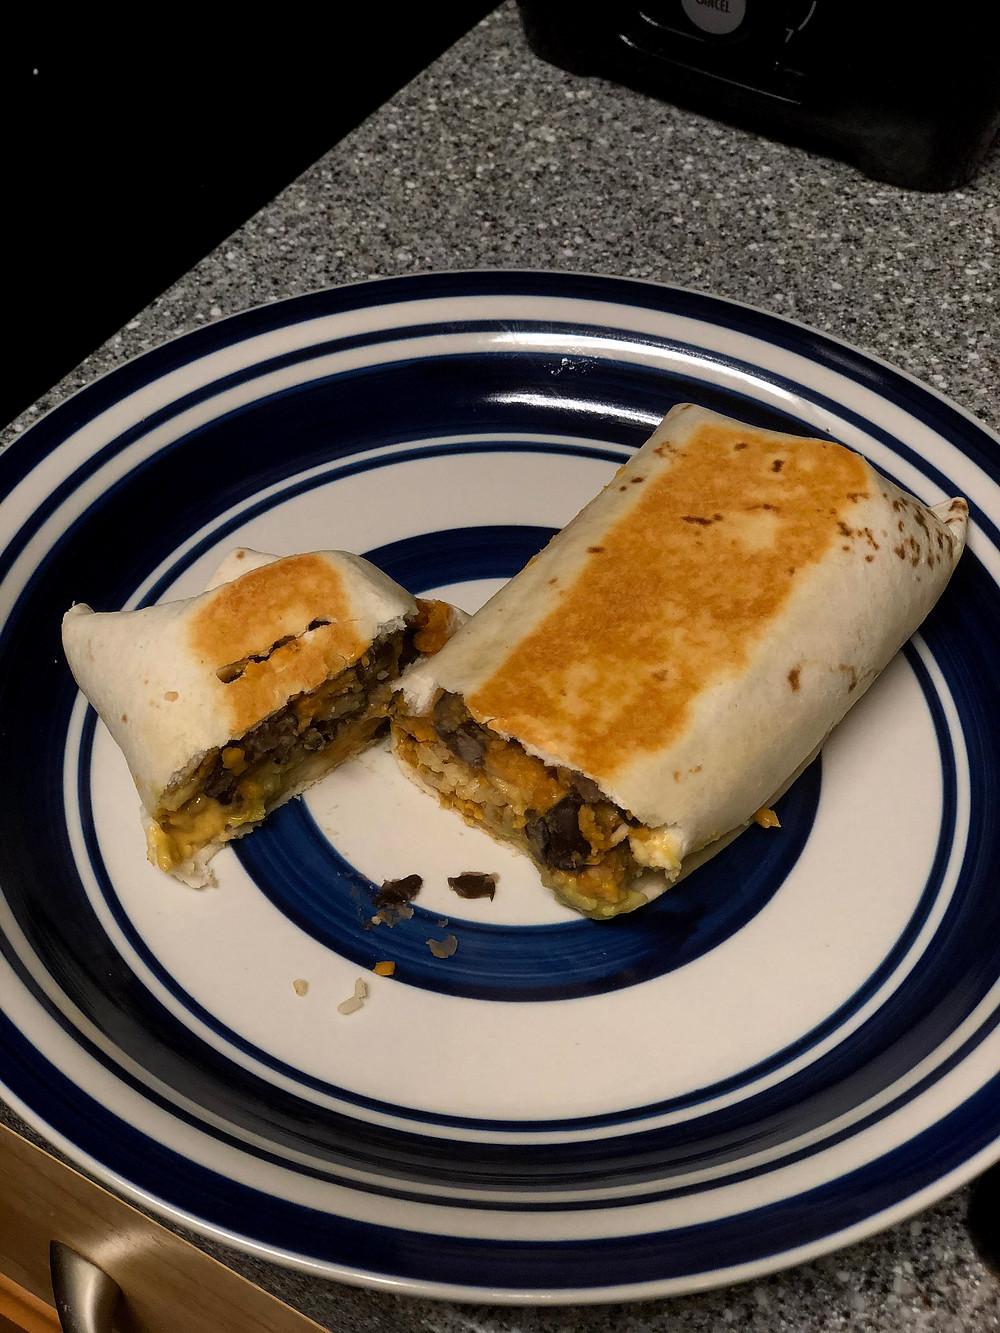 A cut, golden-brown sweet potato and black bean burrito